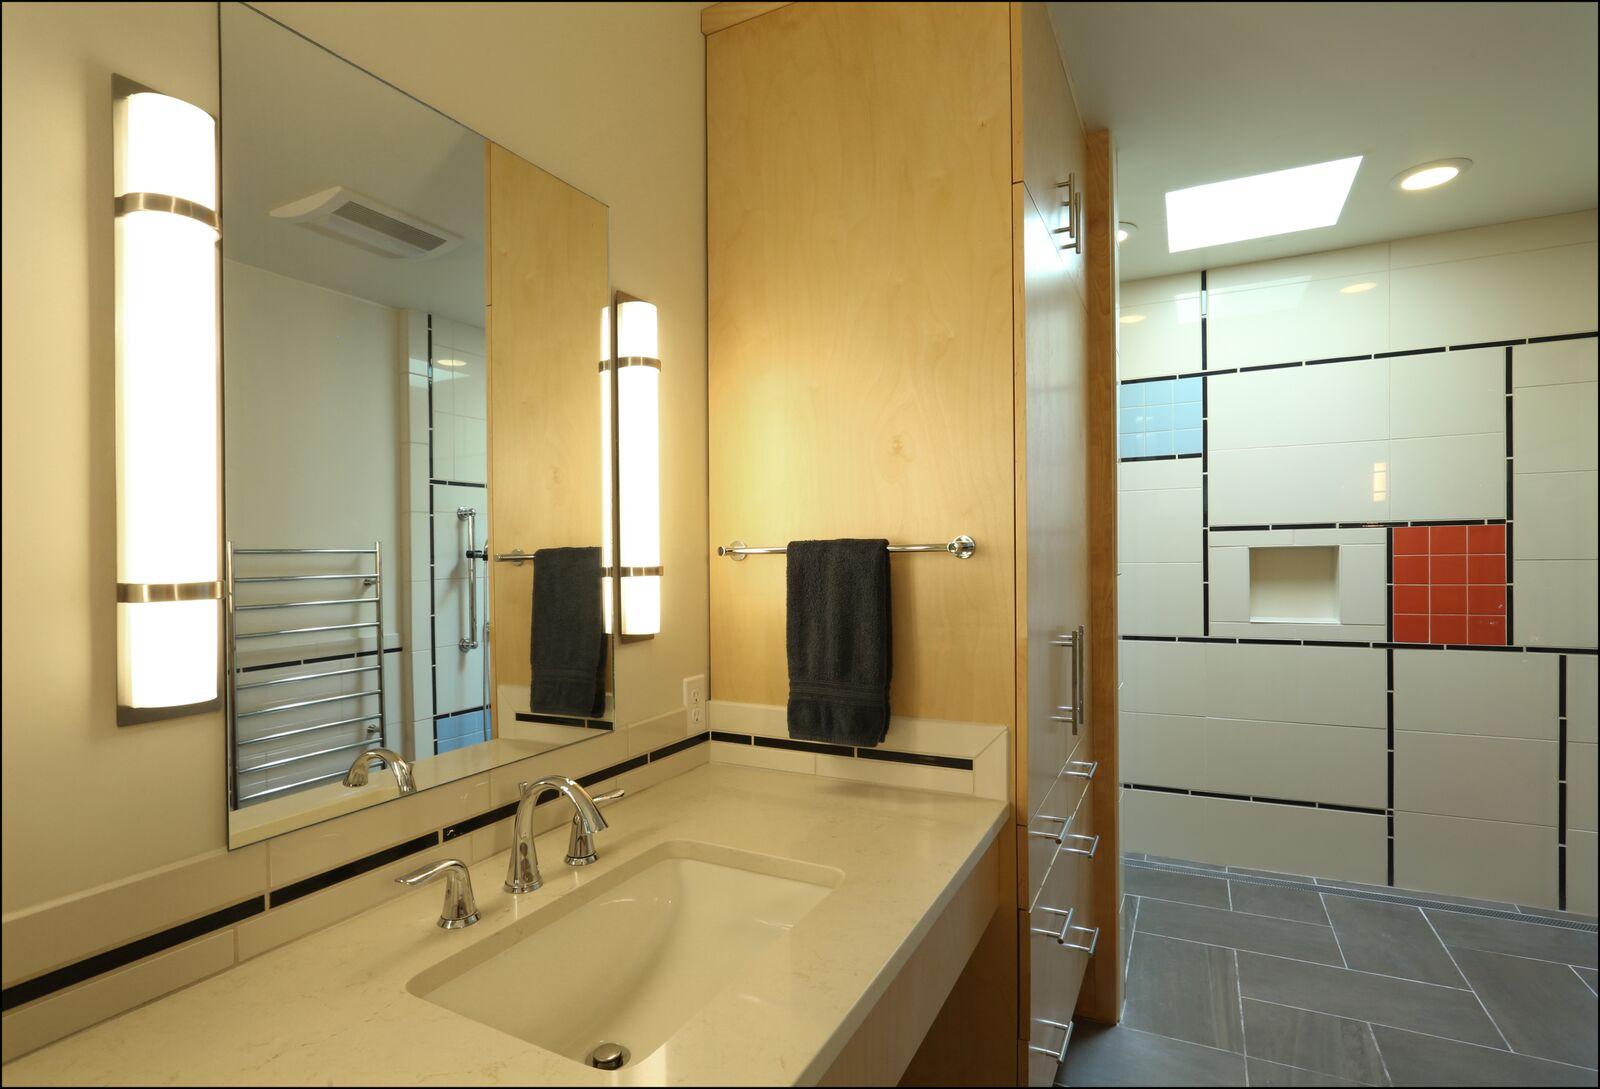 A black towel near the washbasin in the bathroom